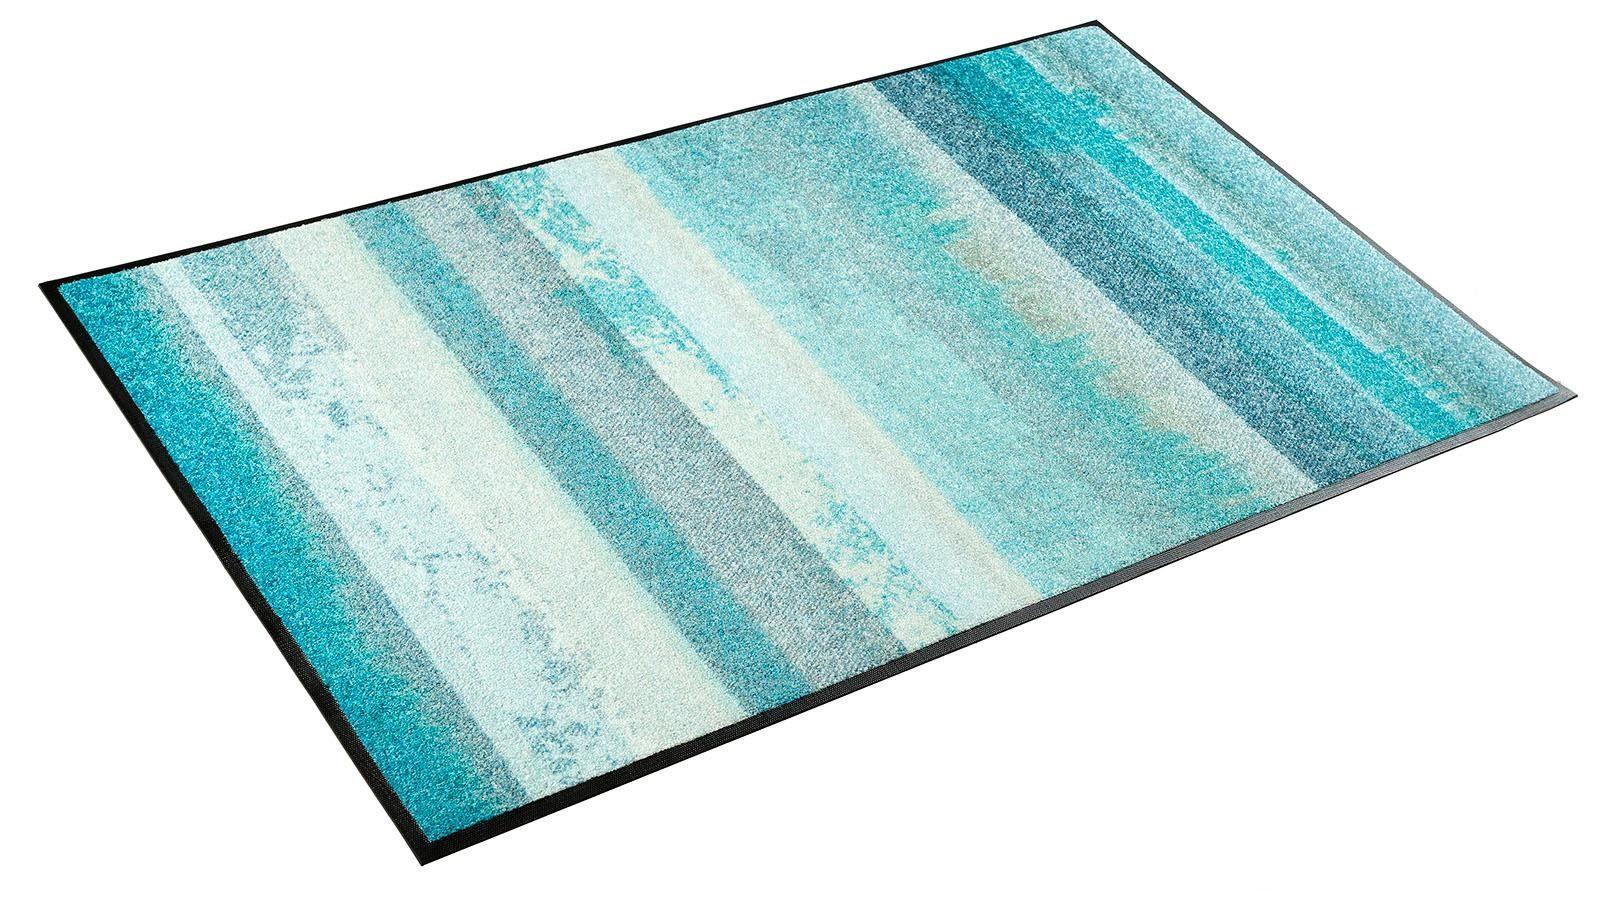 Teppich »Aquamix«, wash+dry by Kleen-Tex, rechteckig, Höhe 7 mm